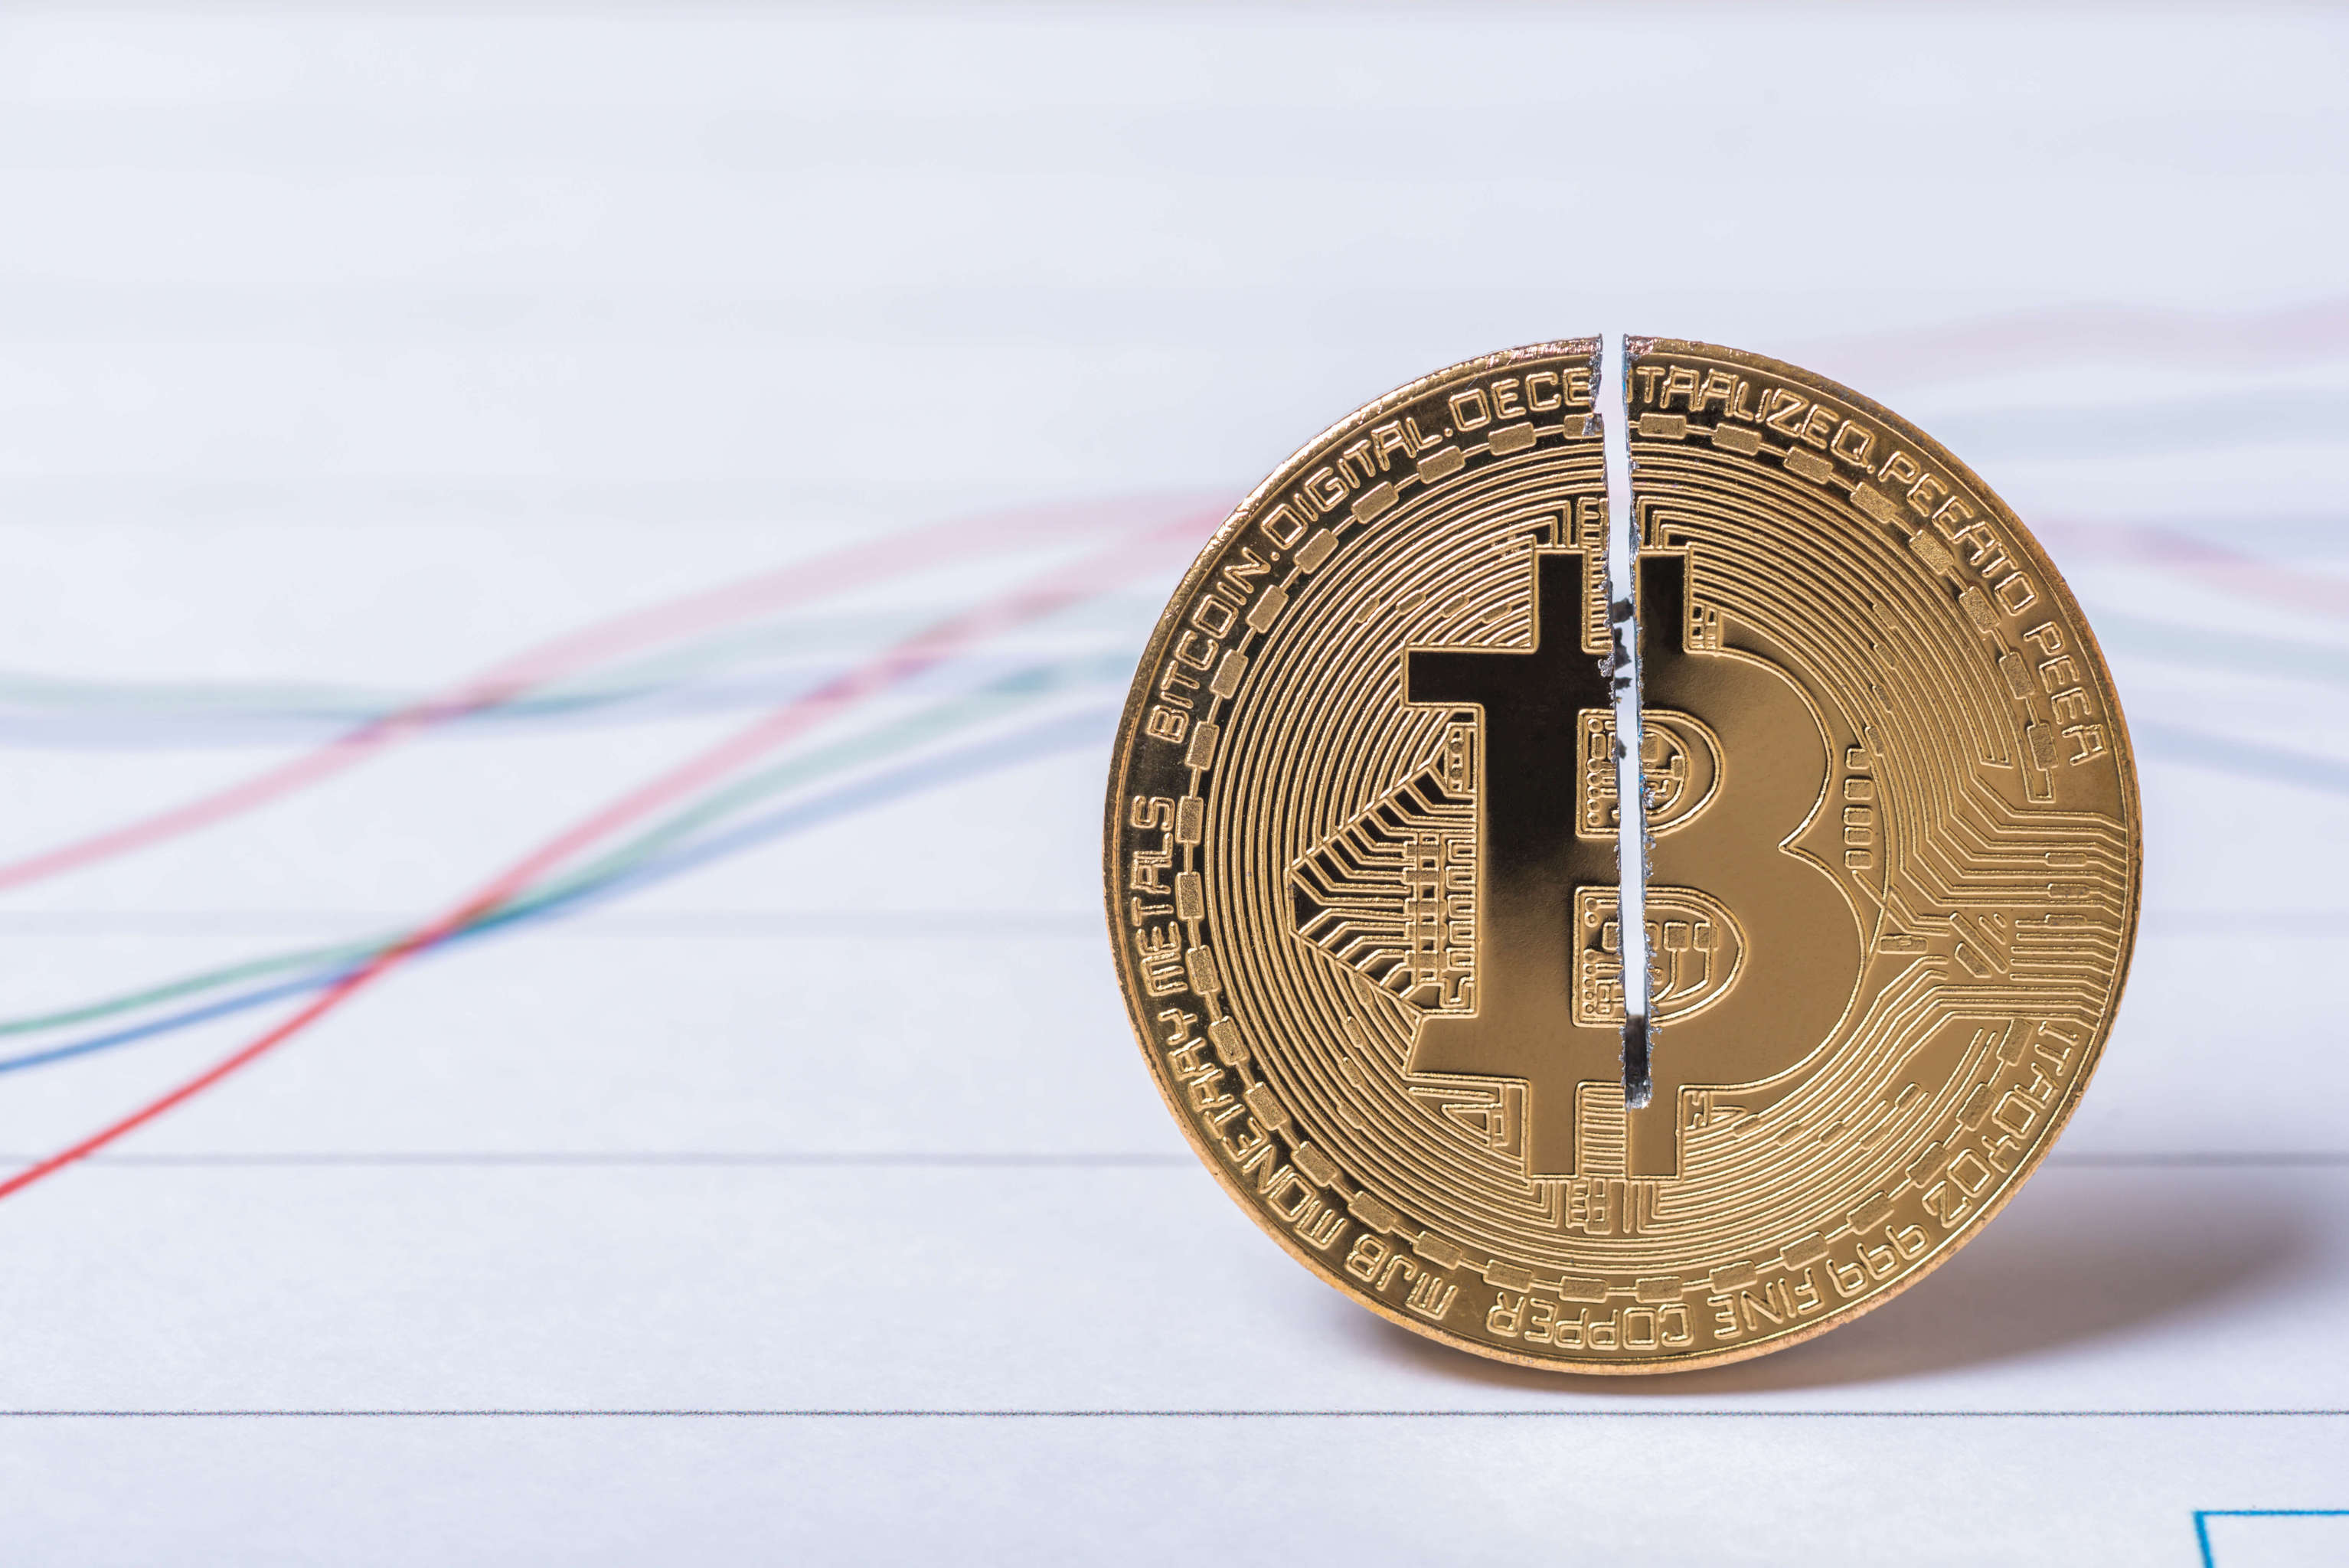 Bitcoin-Kurs bei 250k – auch ohne Halving